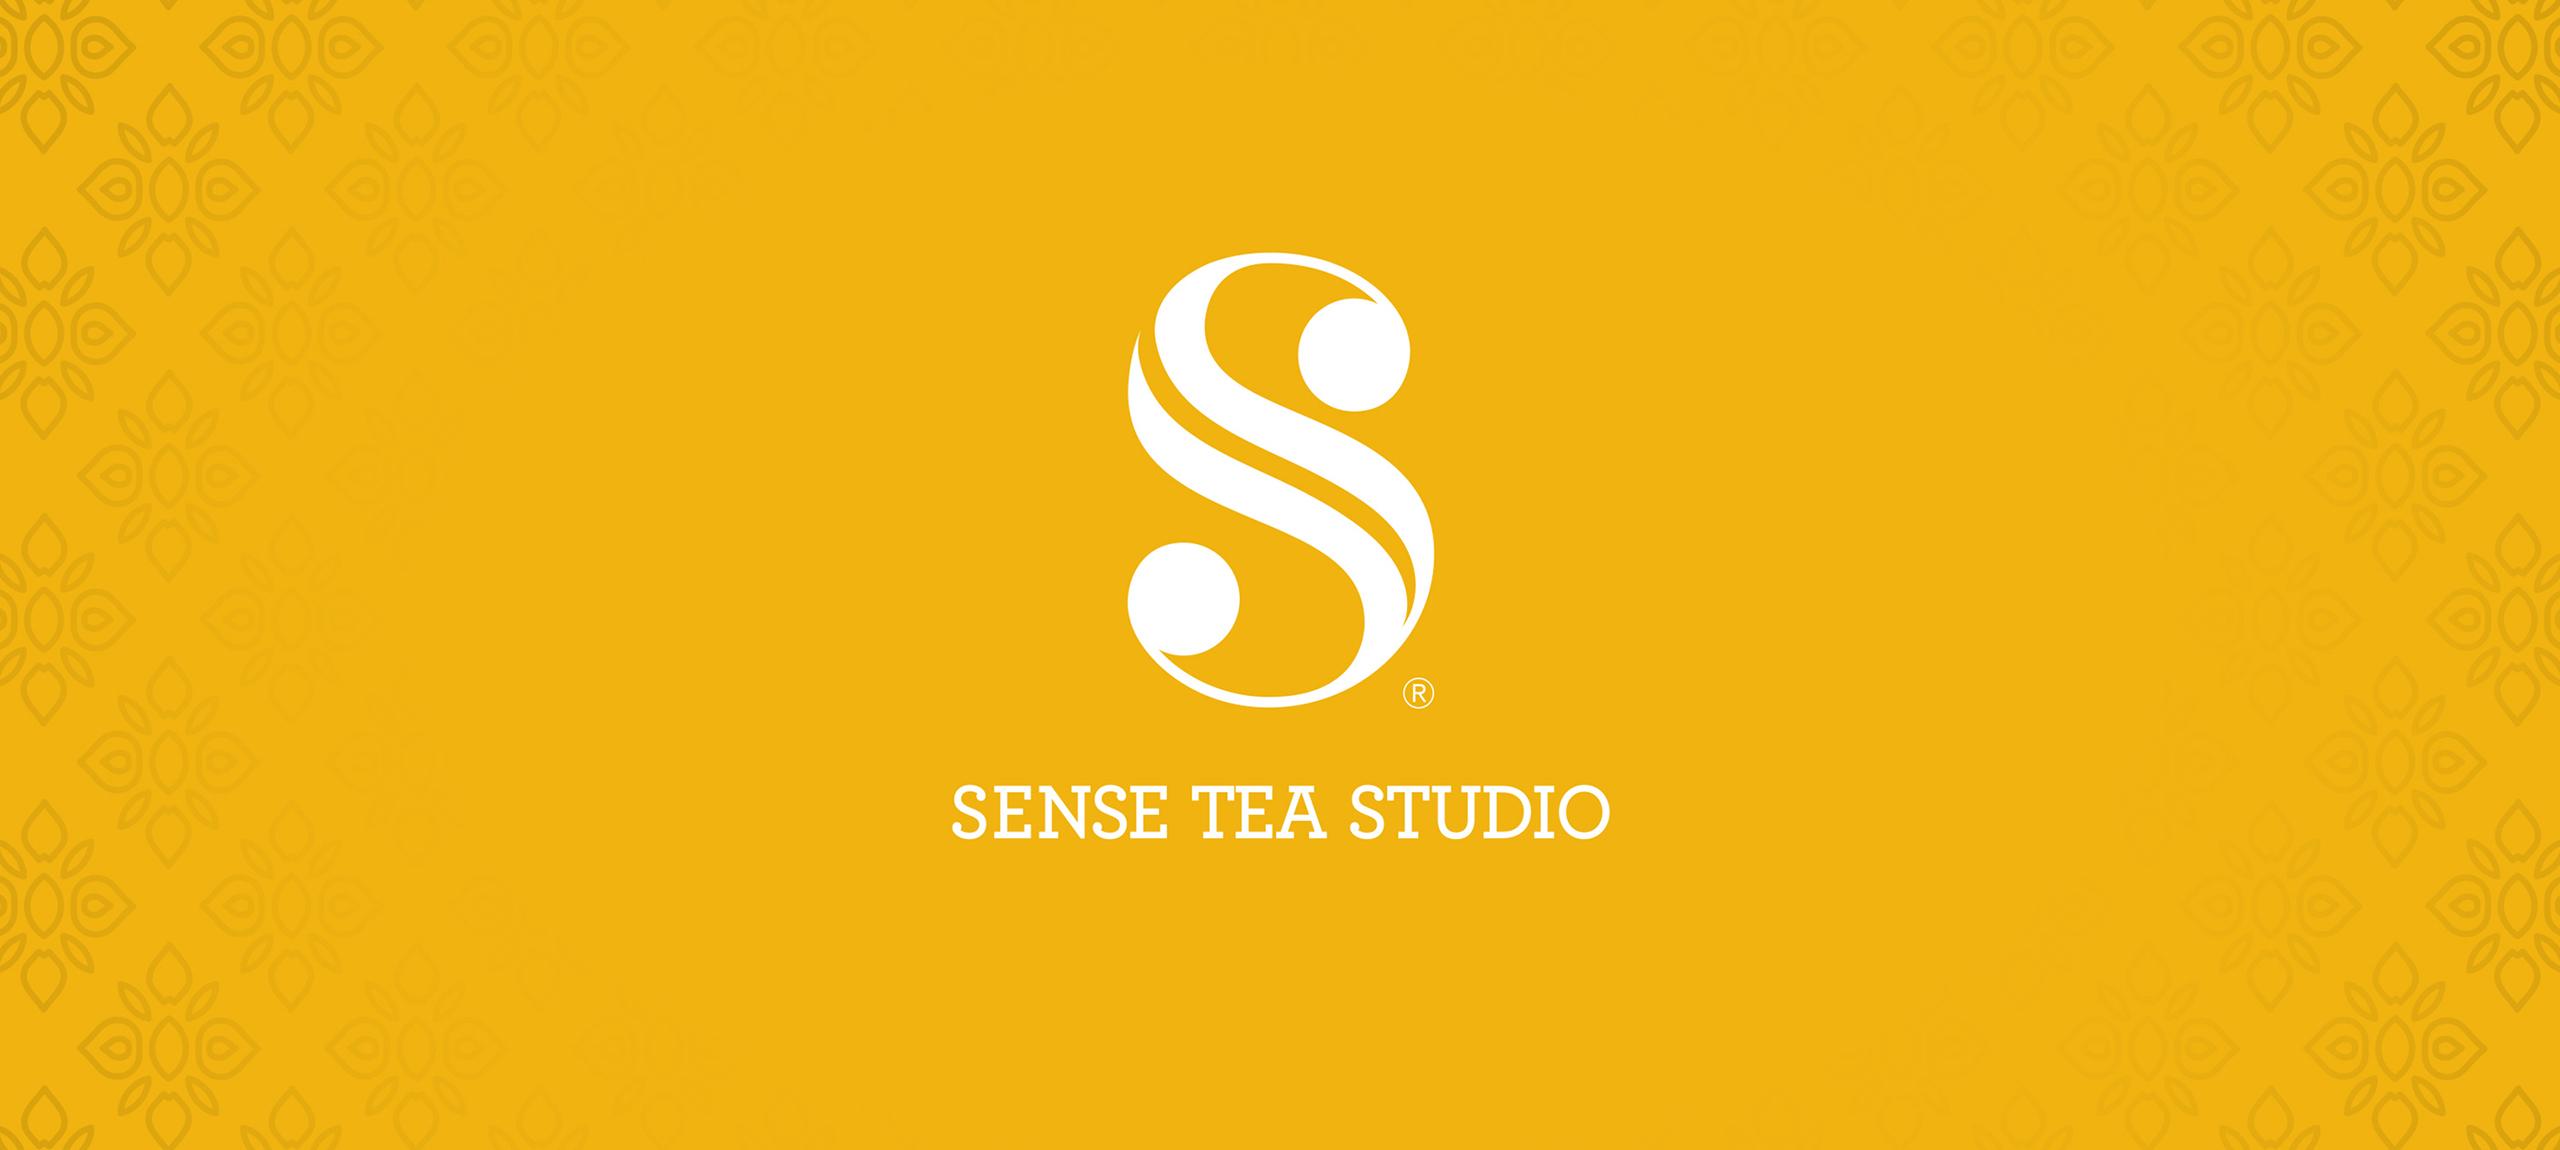 Sense Tea Studio Logo Banner